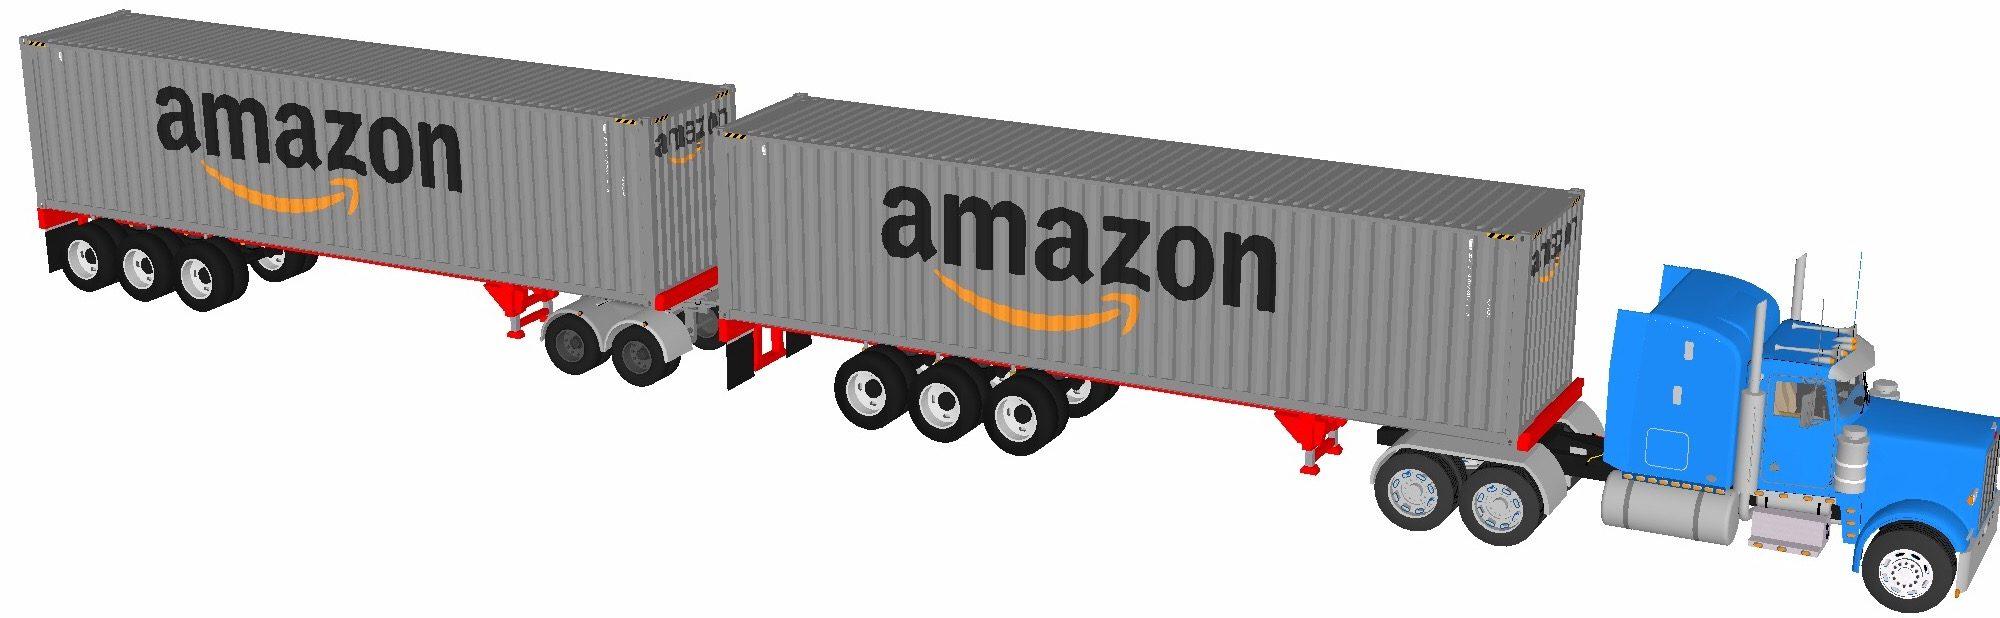 Amazon Hegemony